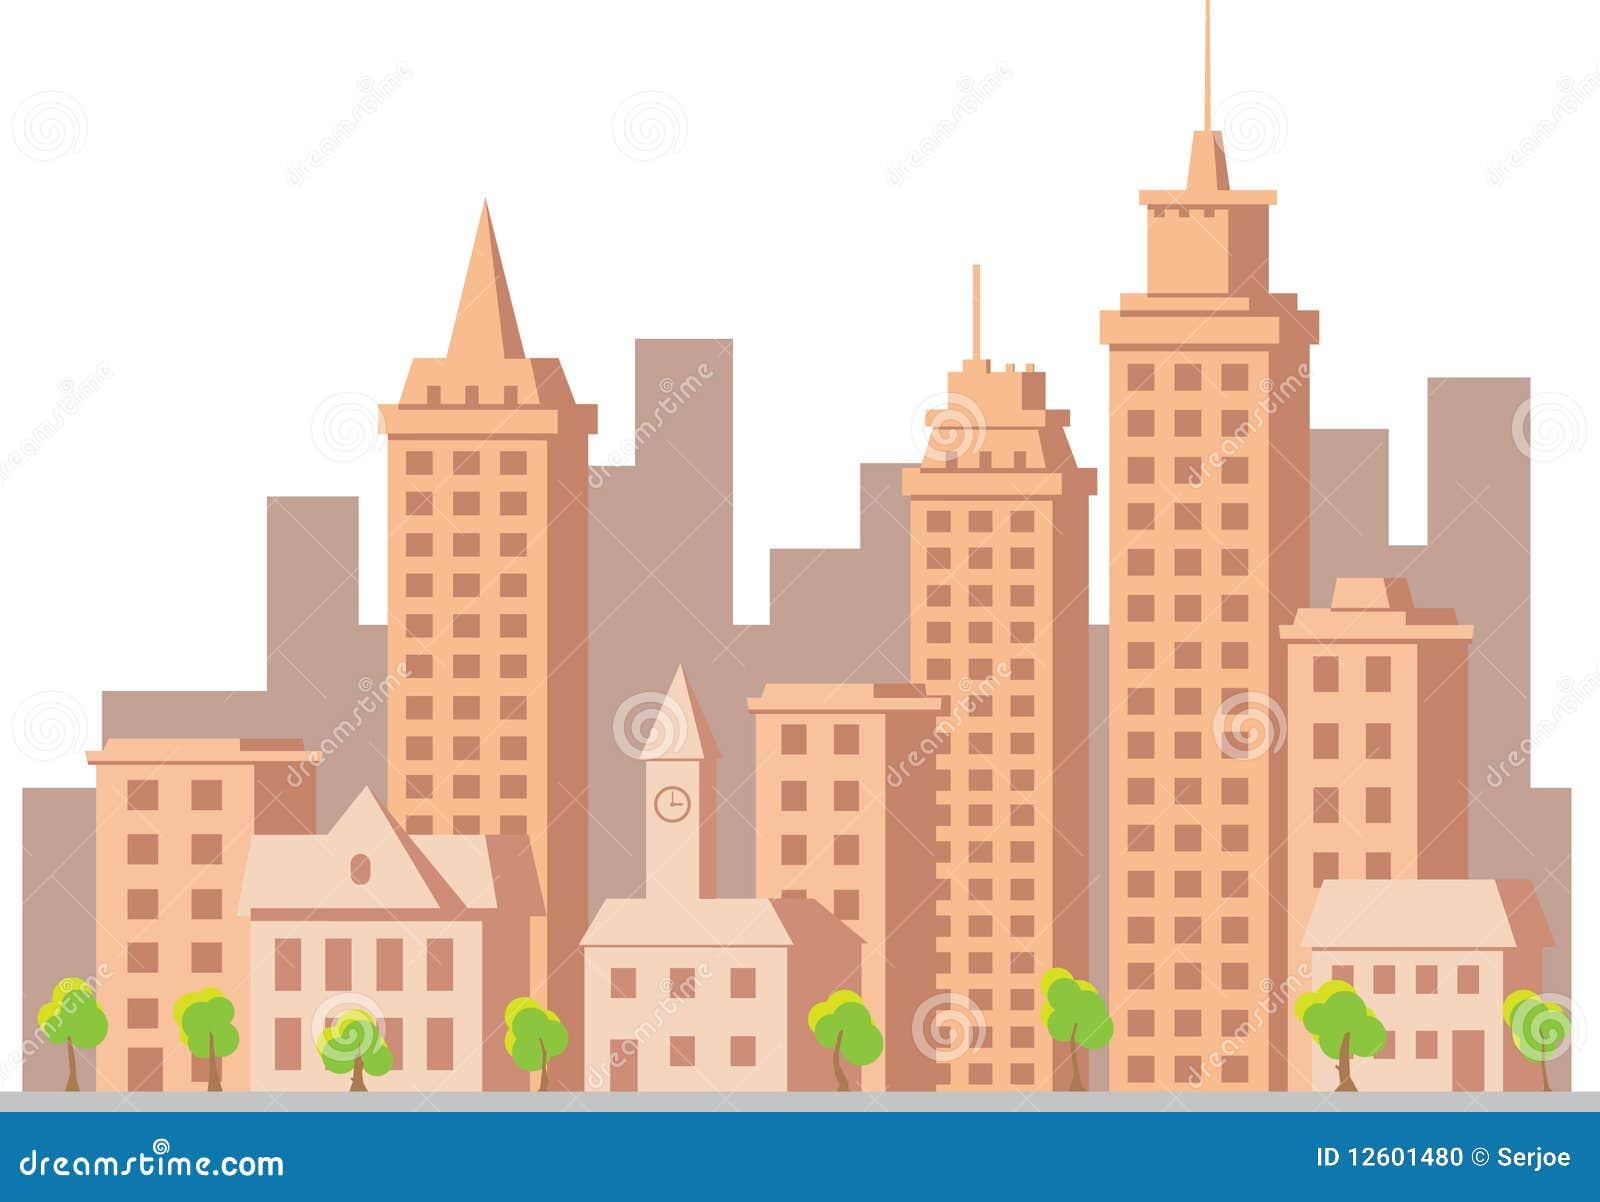 Cartoon Vector Construction Town Stock Photo Image 12601480